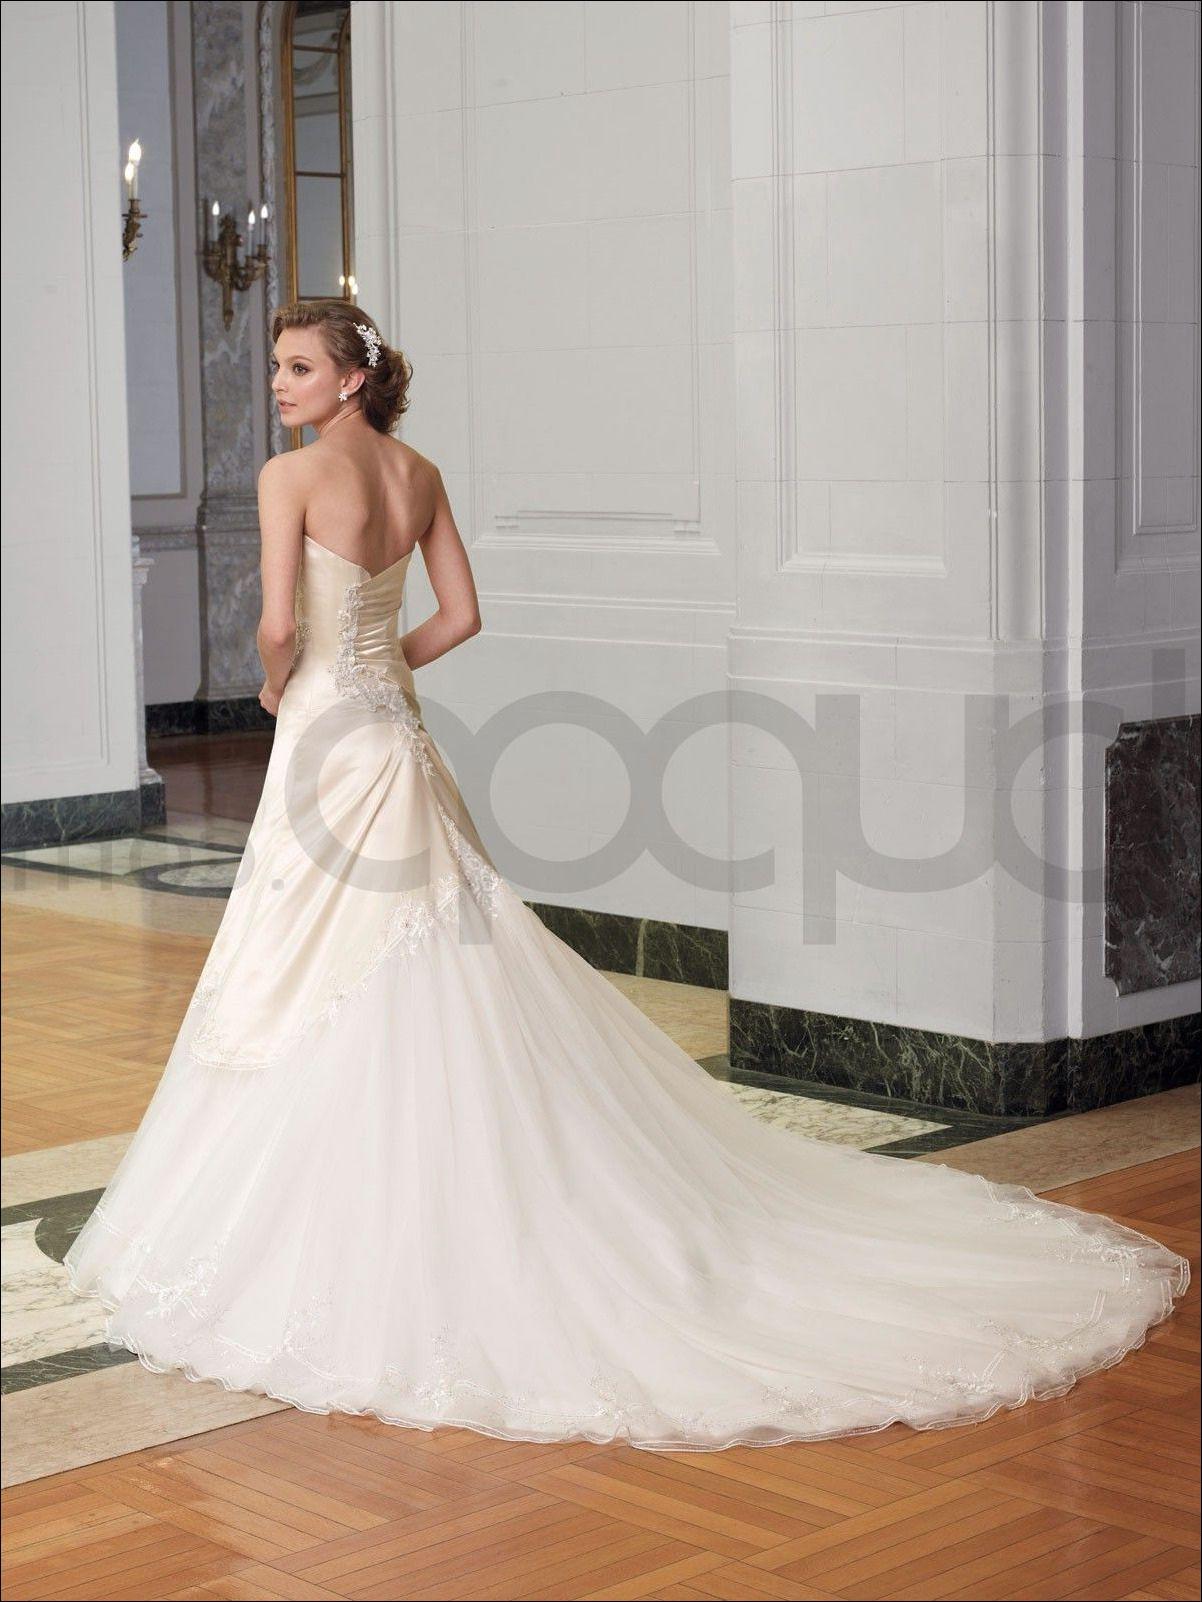 Enchanting Prom Dresses Albany Ny Ornament - Colorful Wedding Dress ...